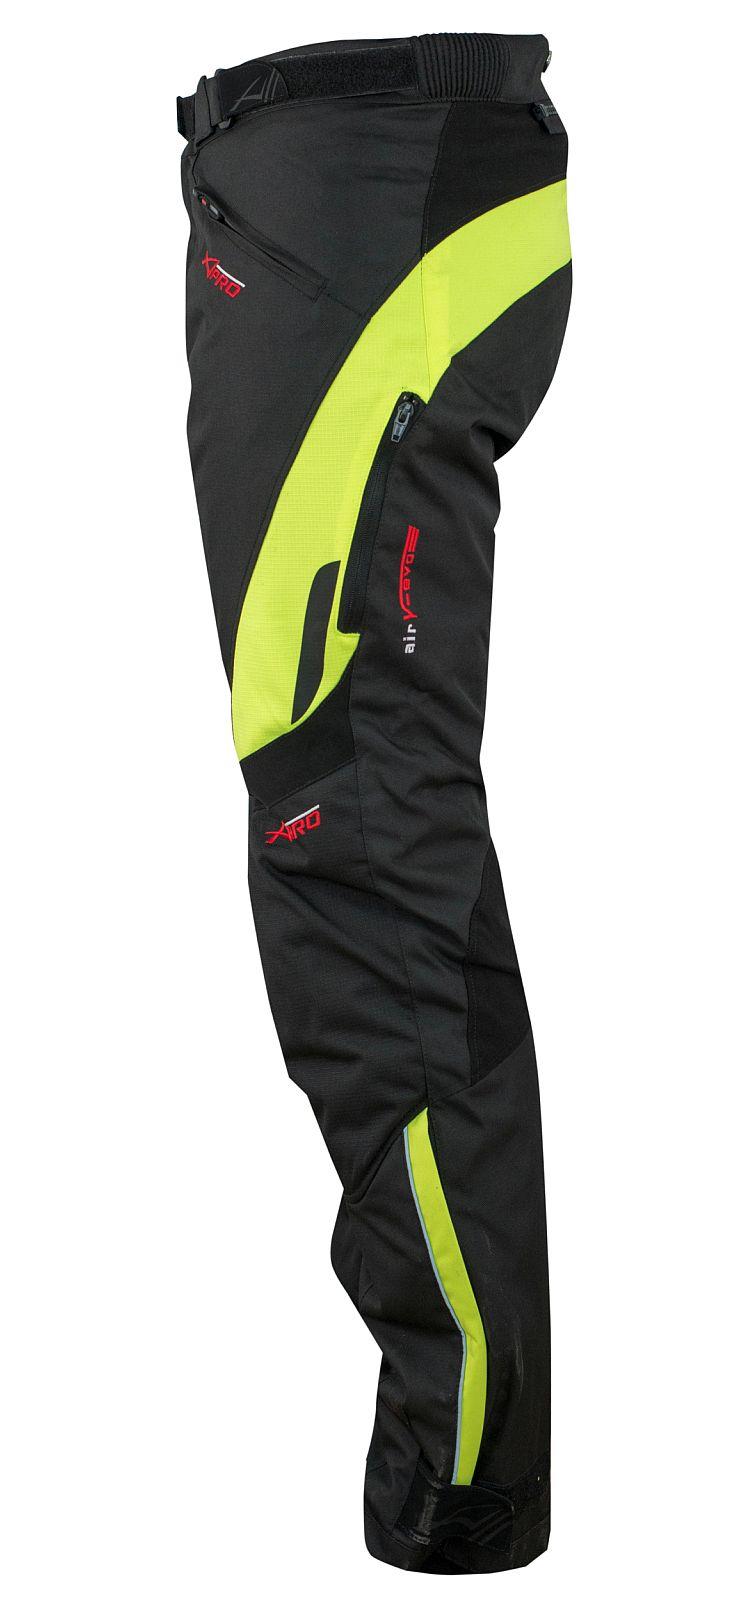 Pantaloni-Donna-Impermeabile-Moto-Imbottitura-Termica-Traspirante-Fluo miniatura 8